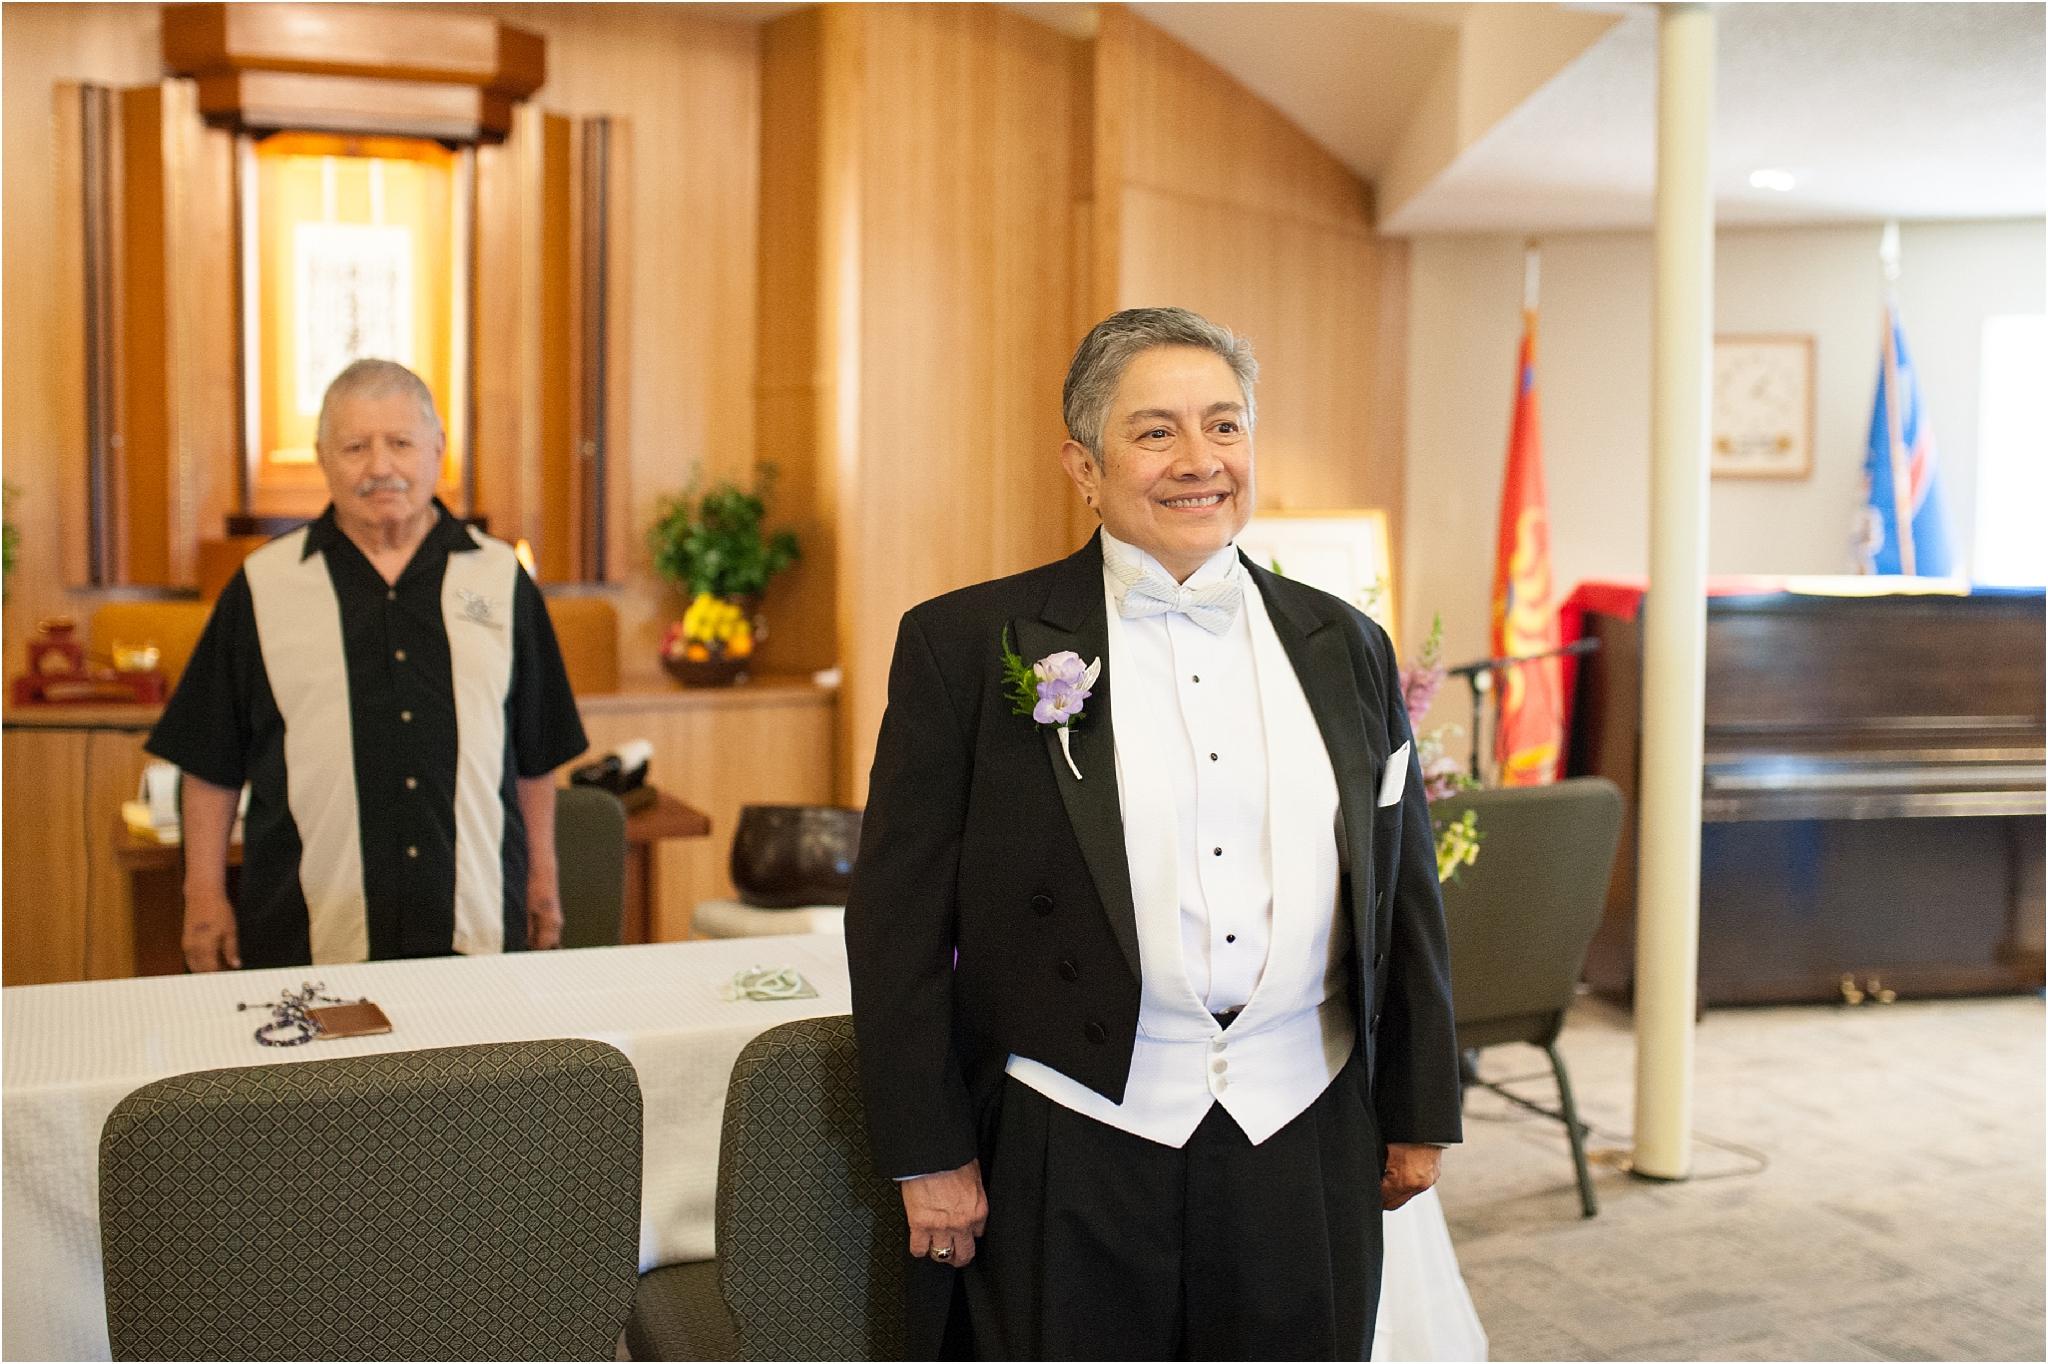 kayla kitts photography - albuquerque wedding photographer - hotel andaluz wedding_0004.jpg